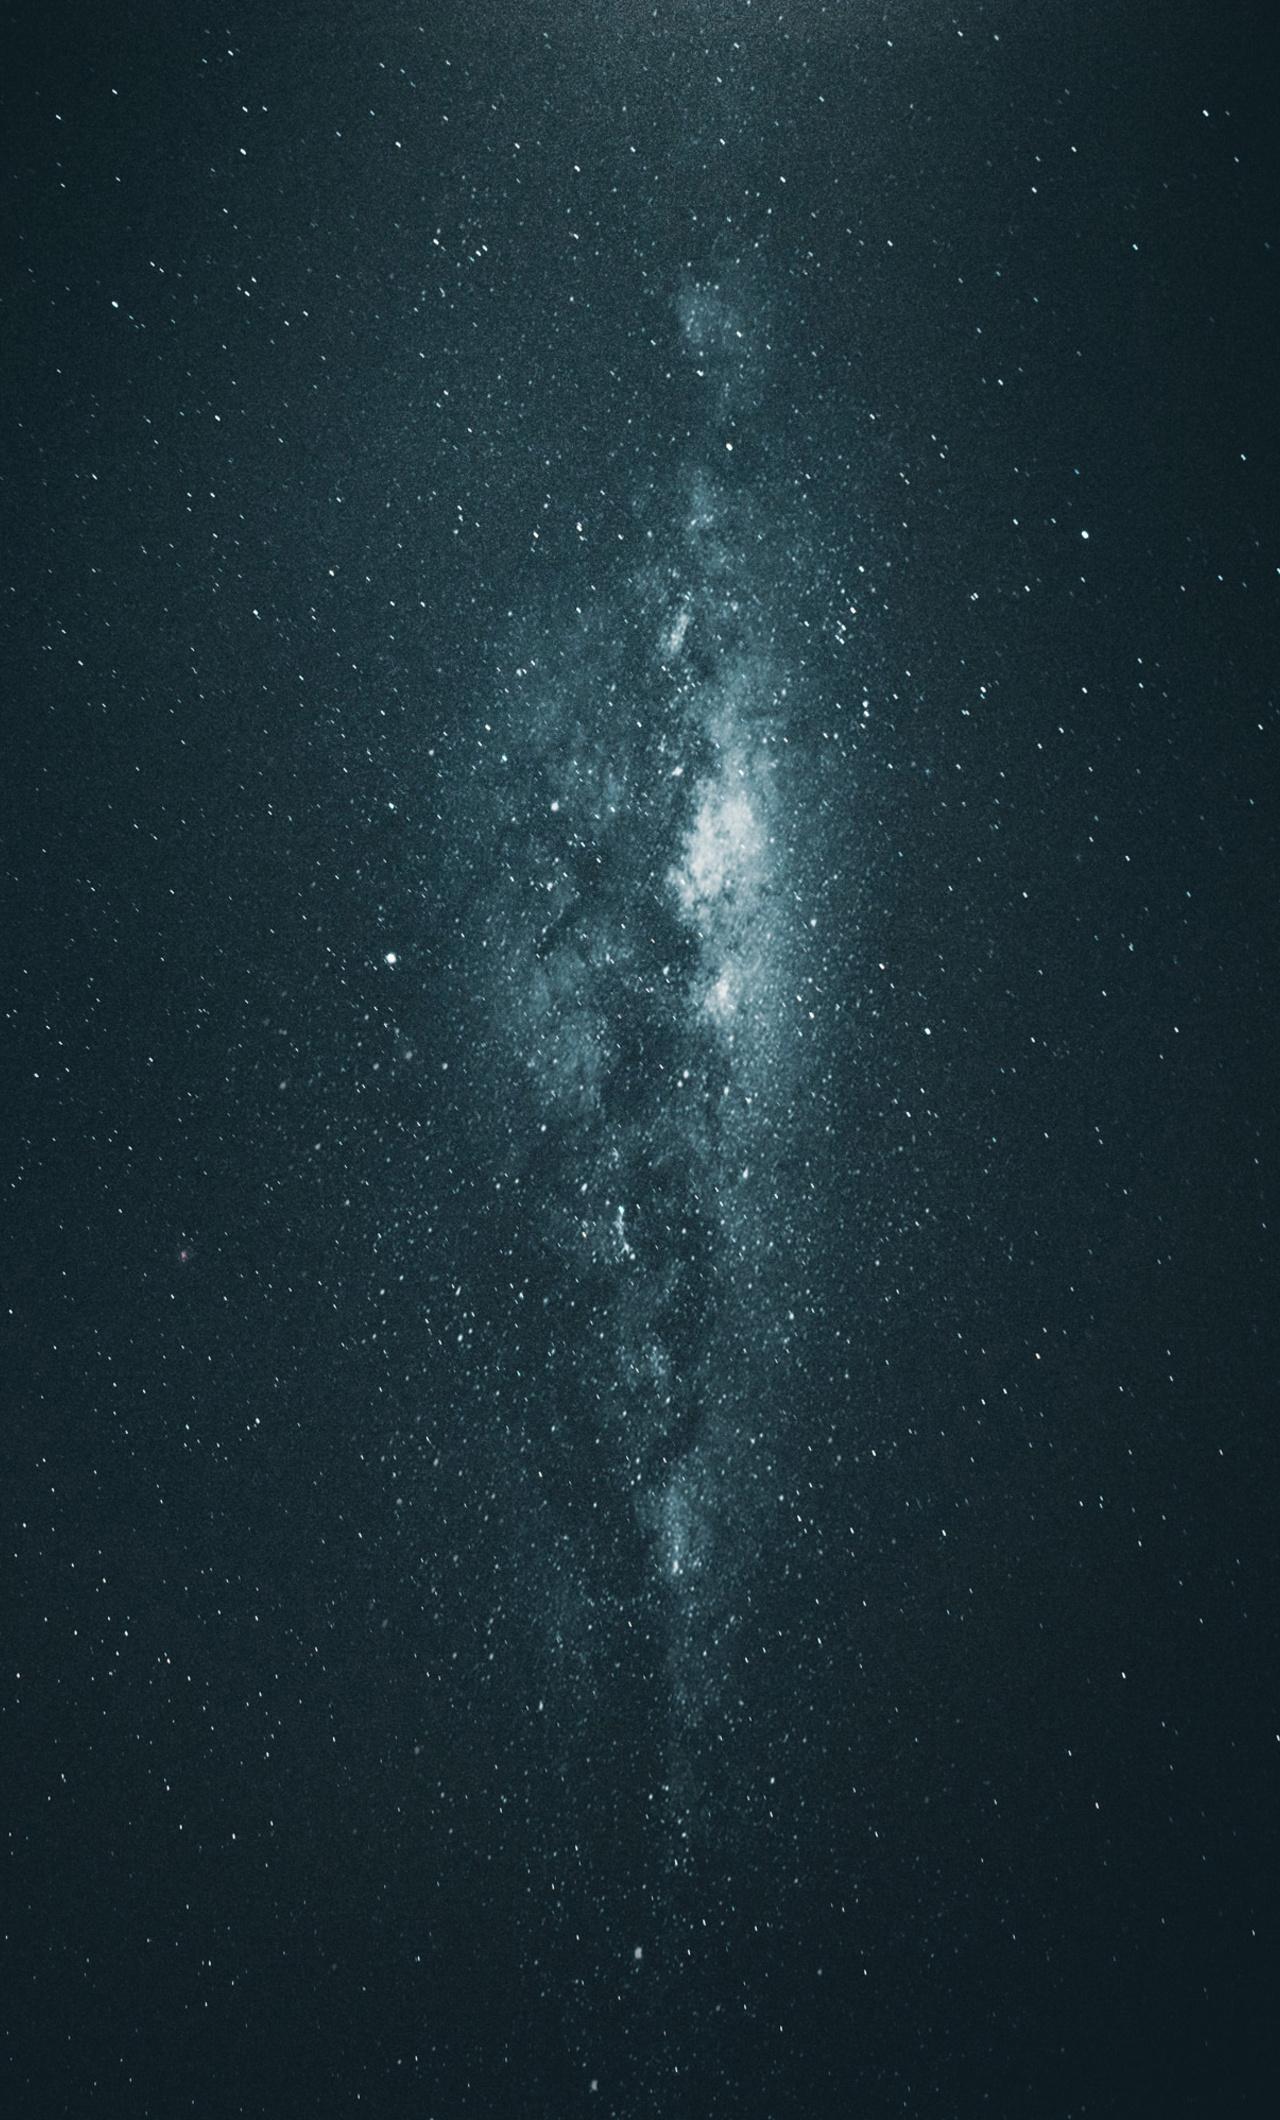 milky-way-astronomy-evening-kh.jpg